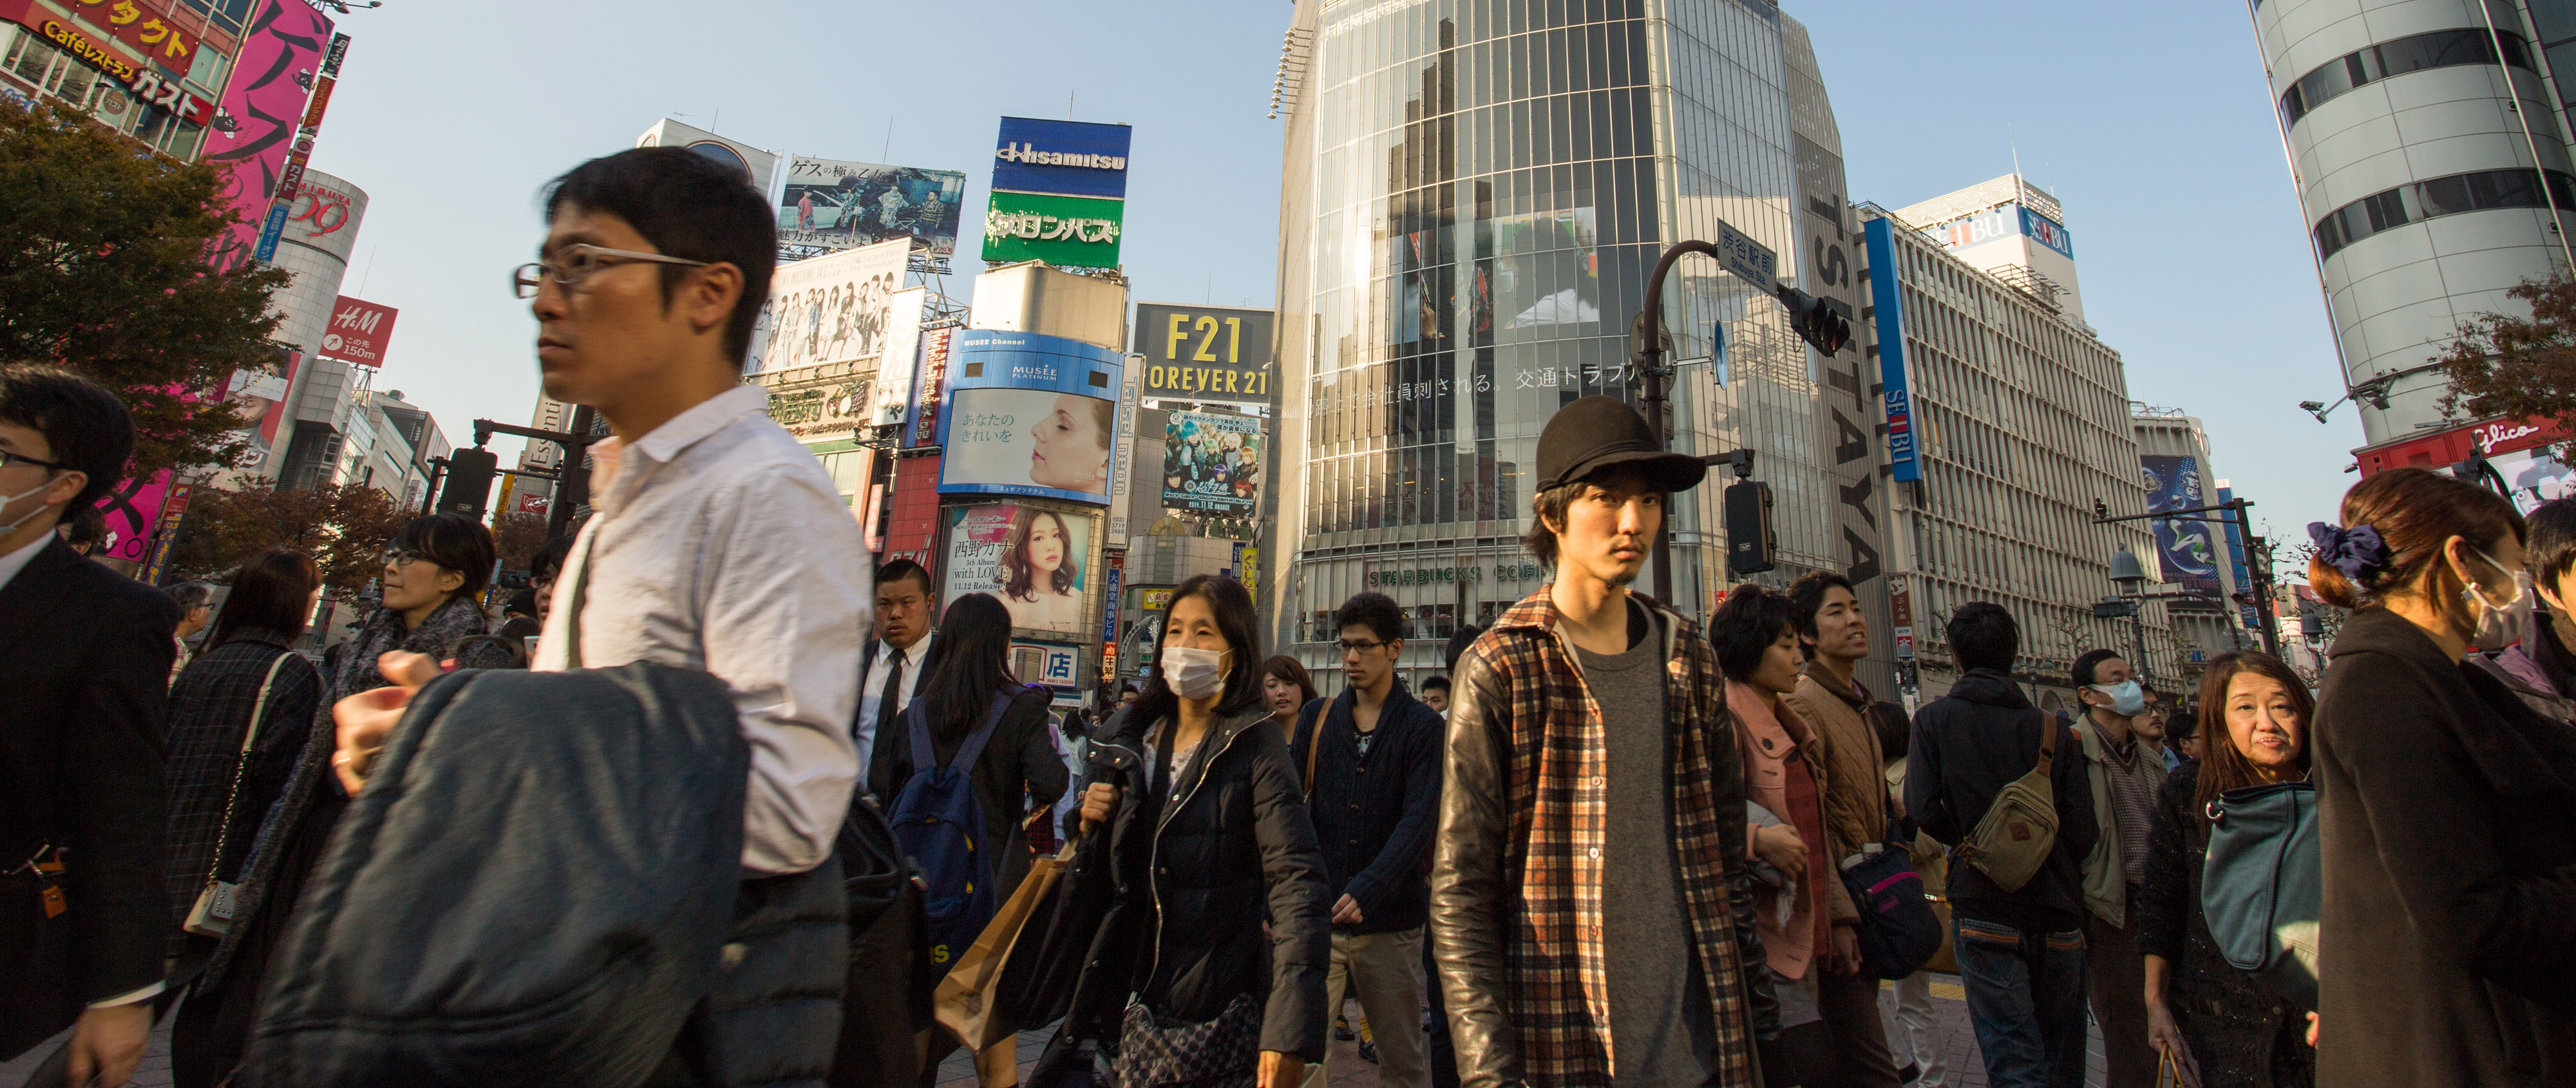 Tokyo, Japan - Jason Ortego